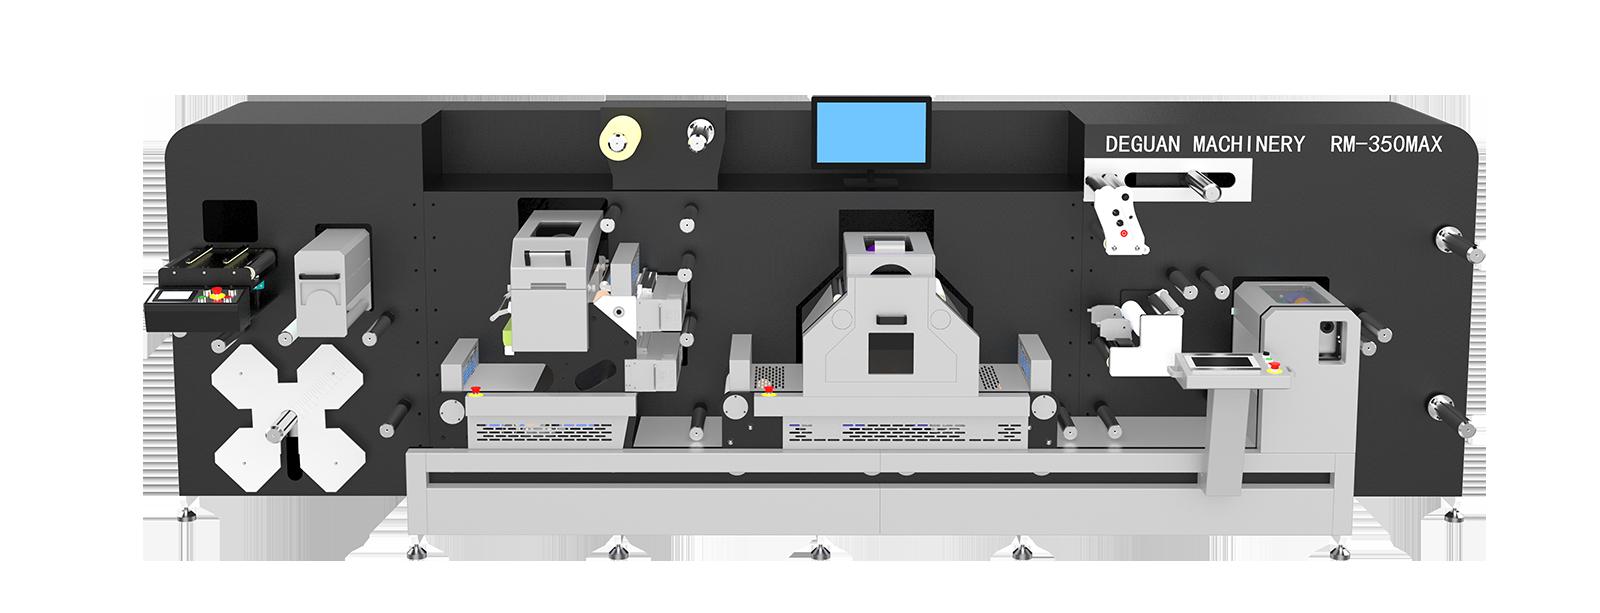 Modular machine high - speed batch printing die - cutting